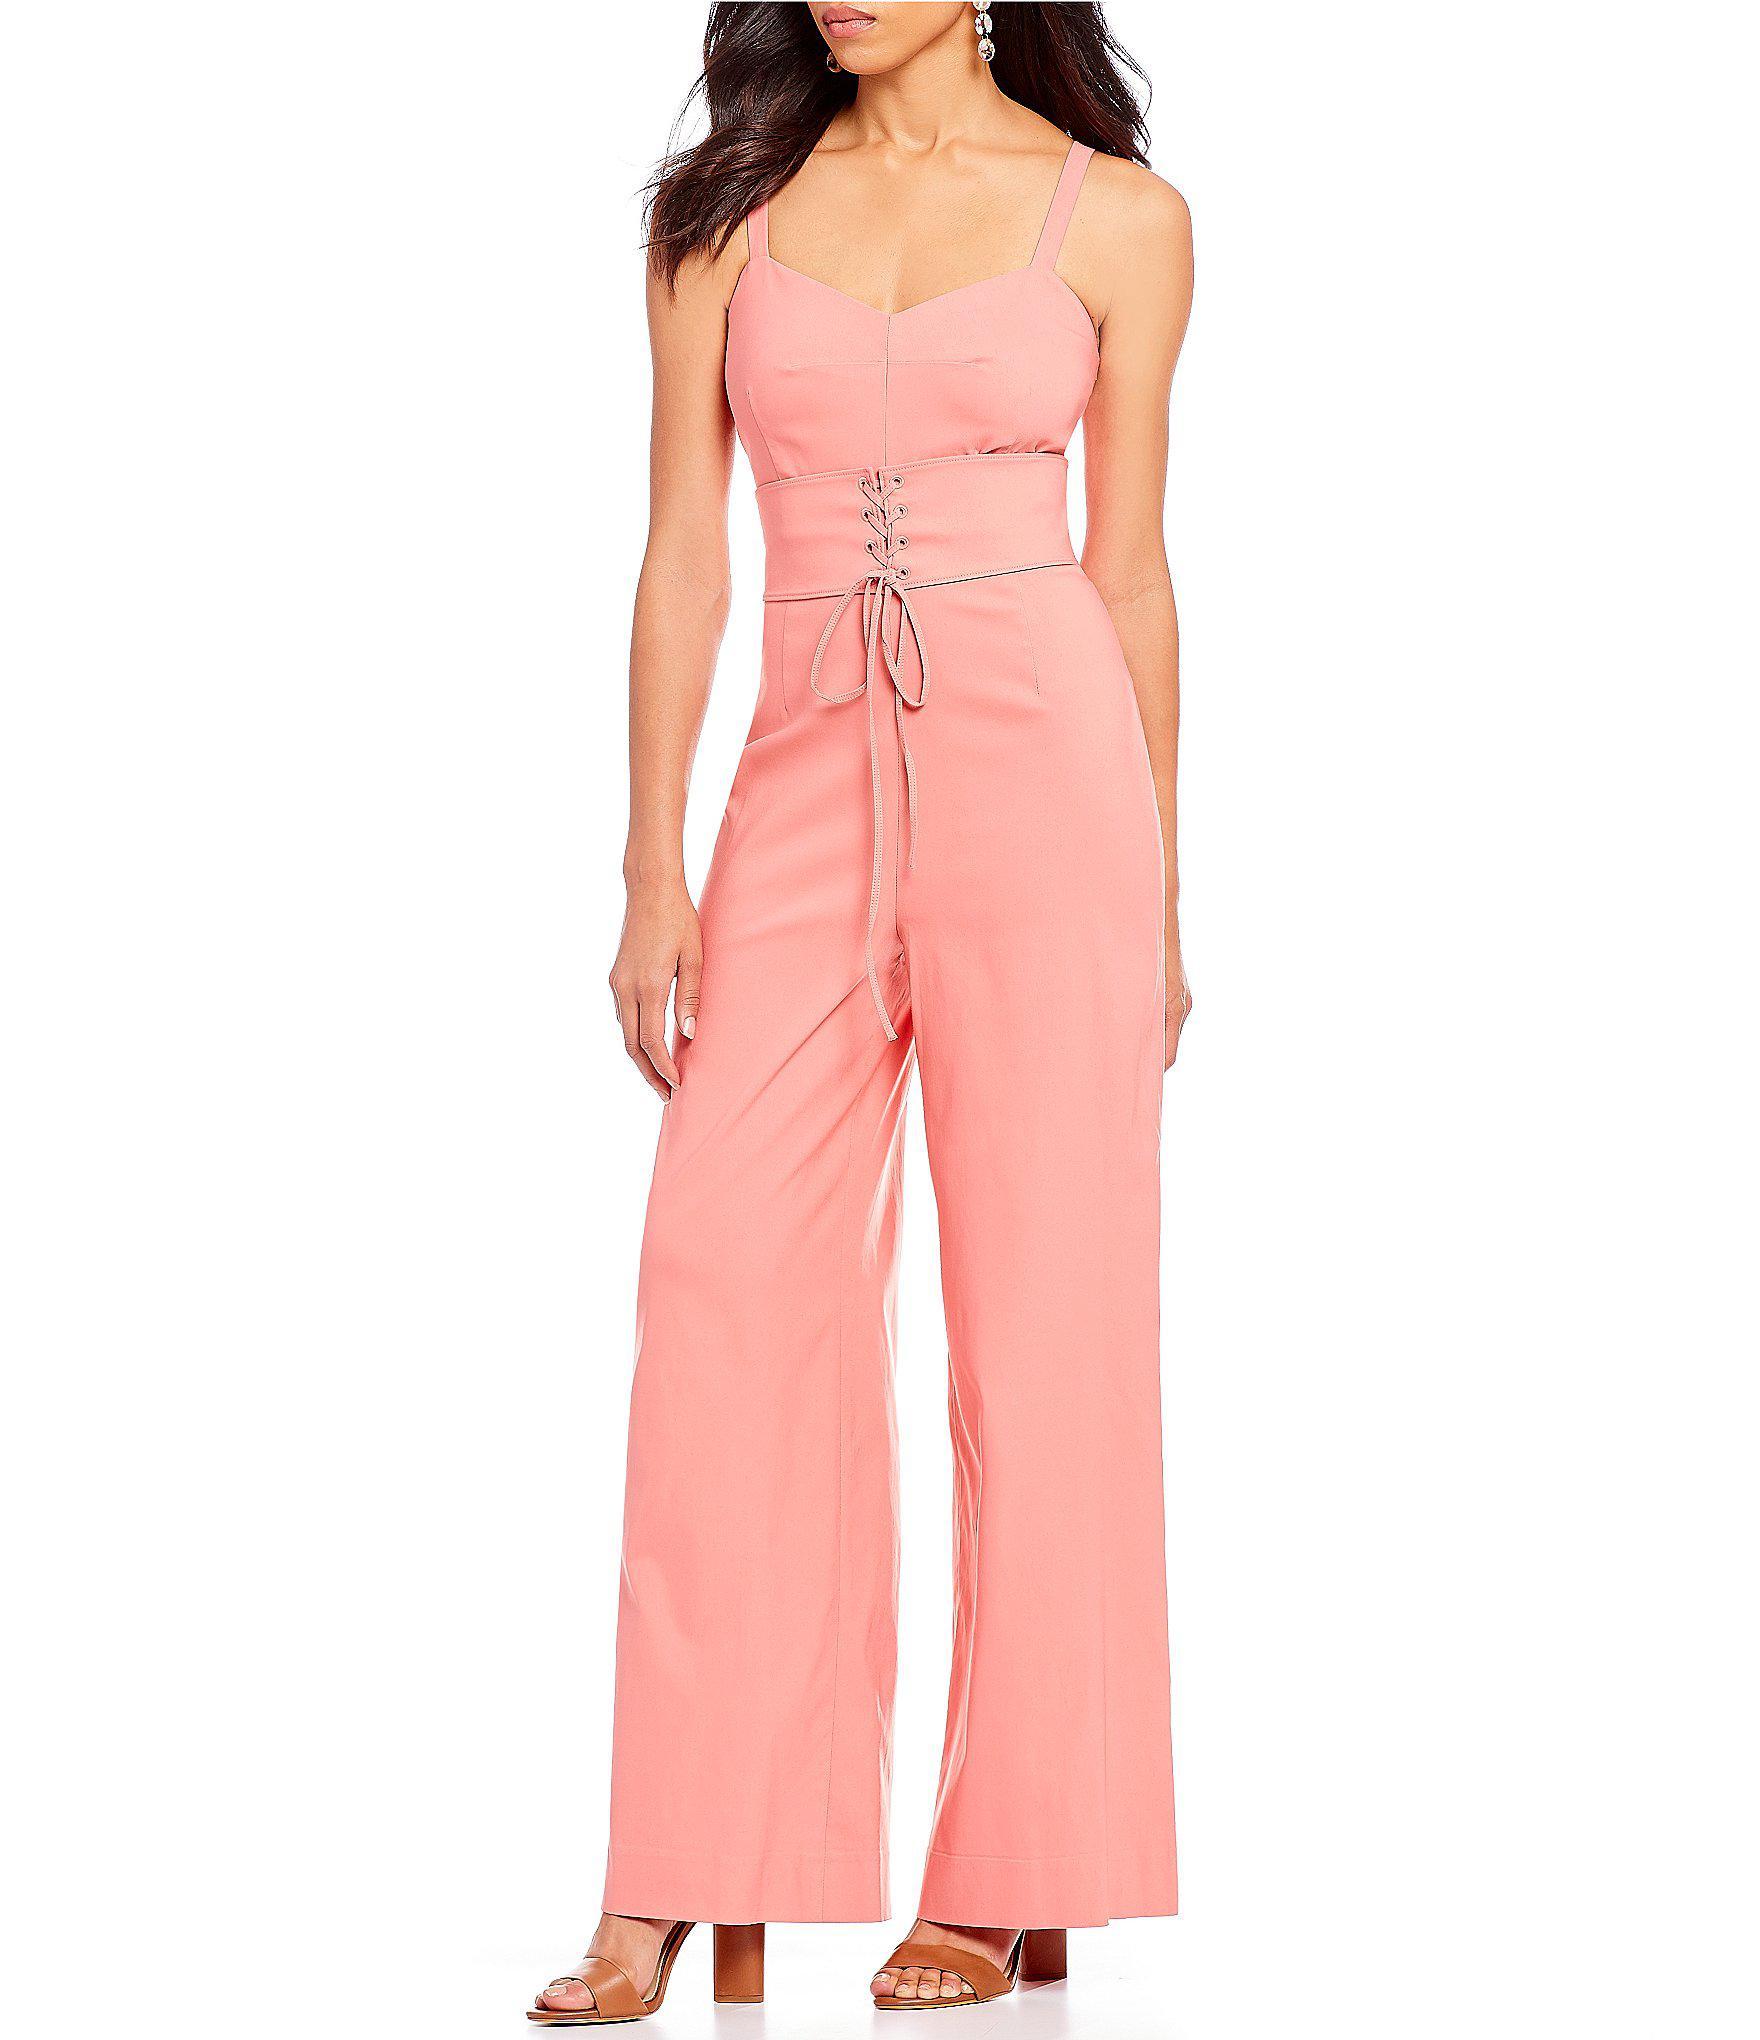 91f6f7f5d8a Lyst - Gianni Bini Kyra Lace-up Corset Waist Wide Leg Jumpsuit in Pink